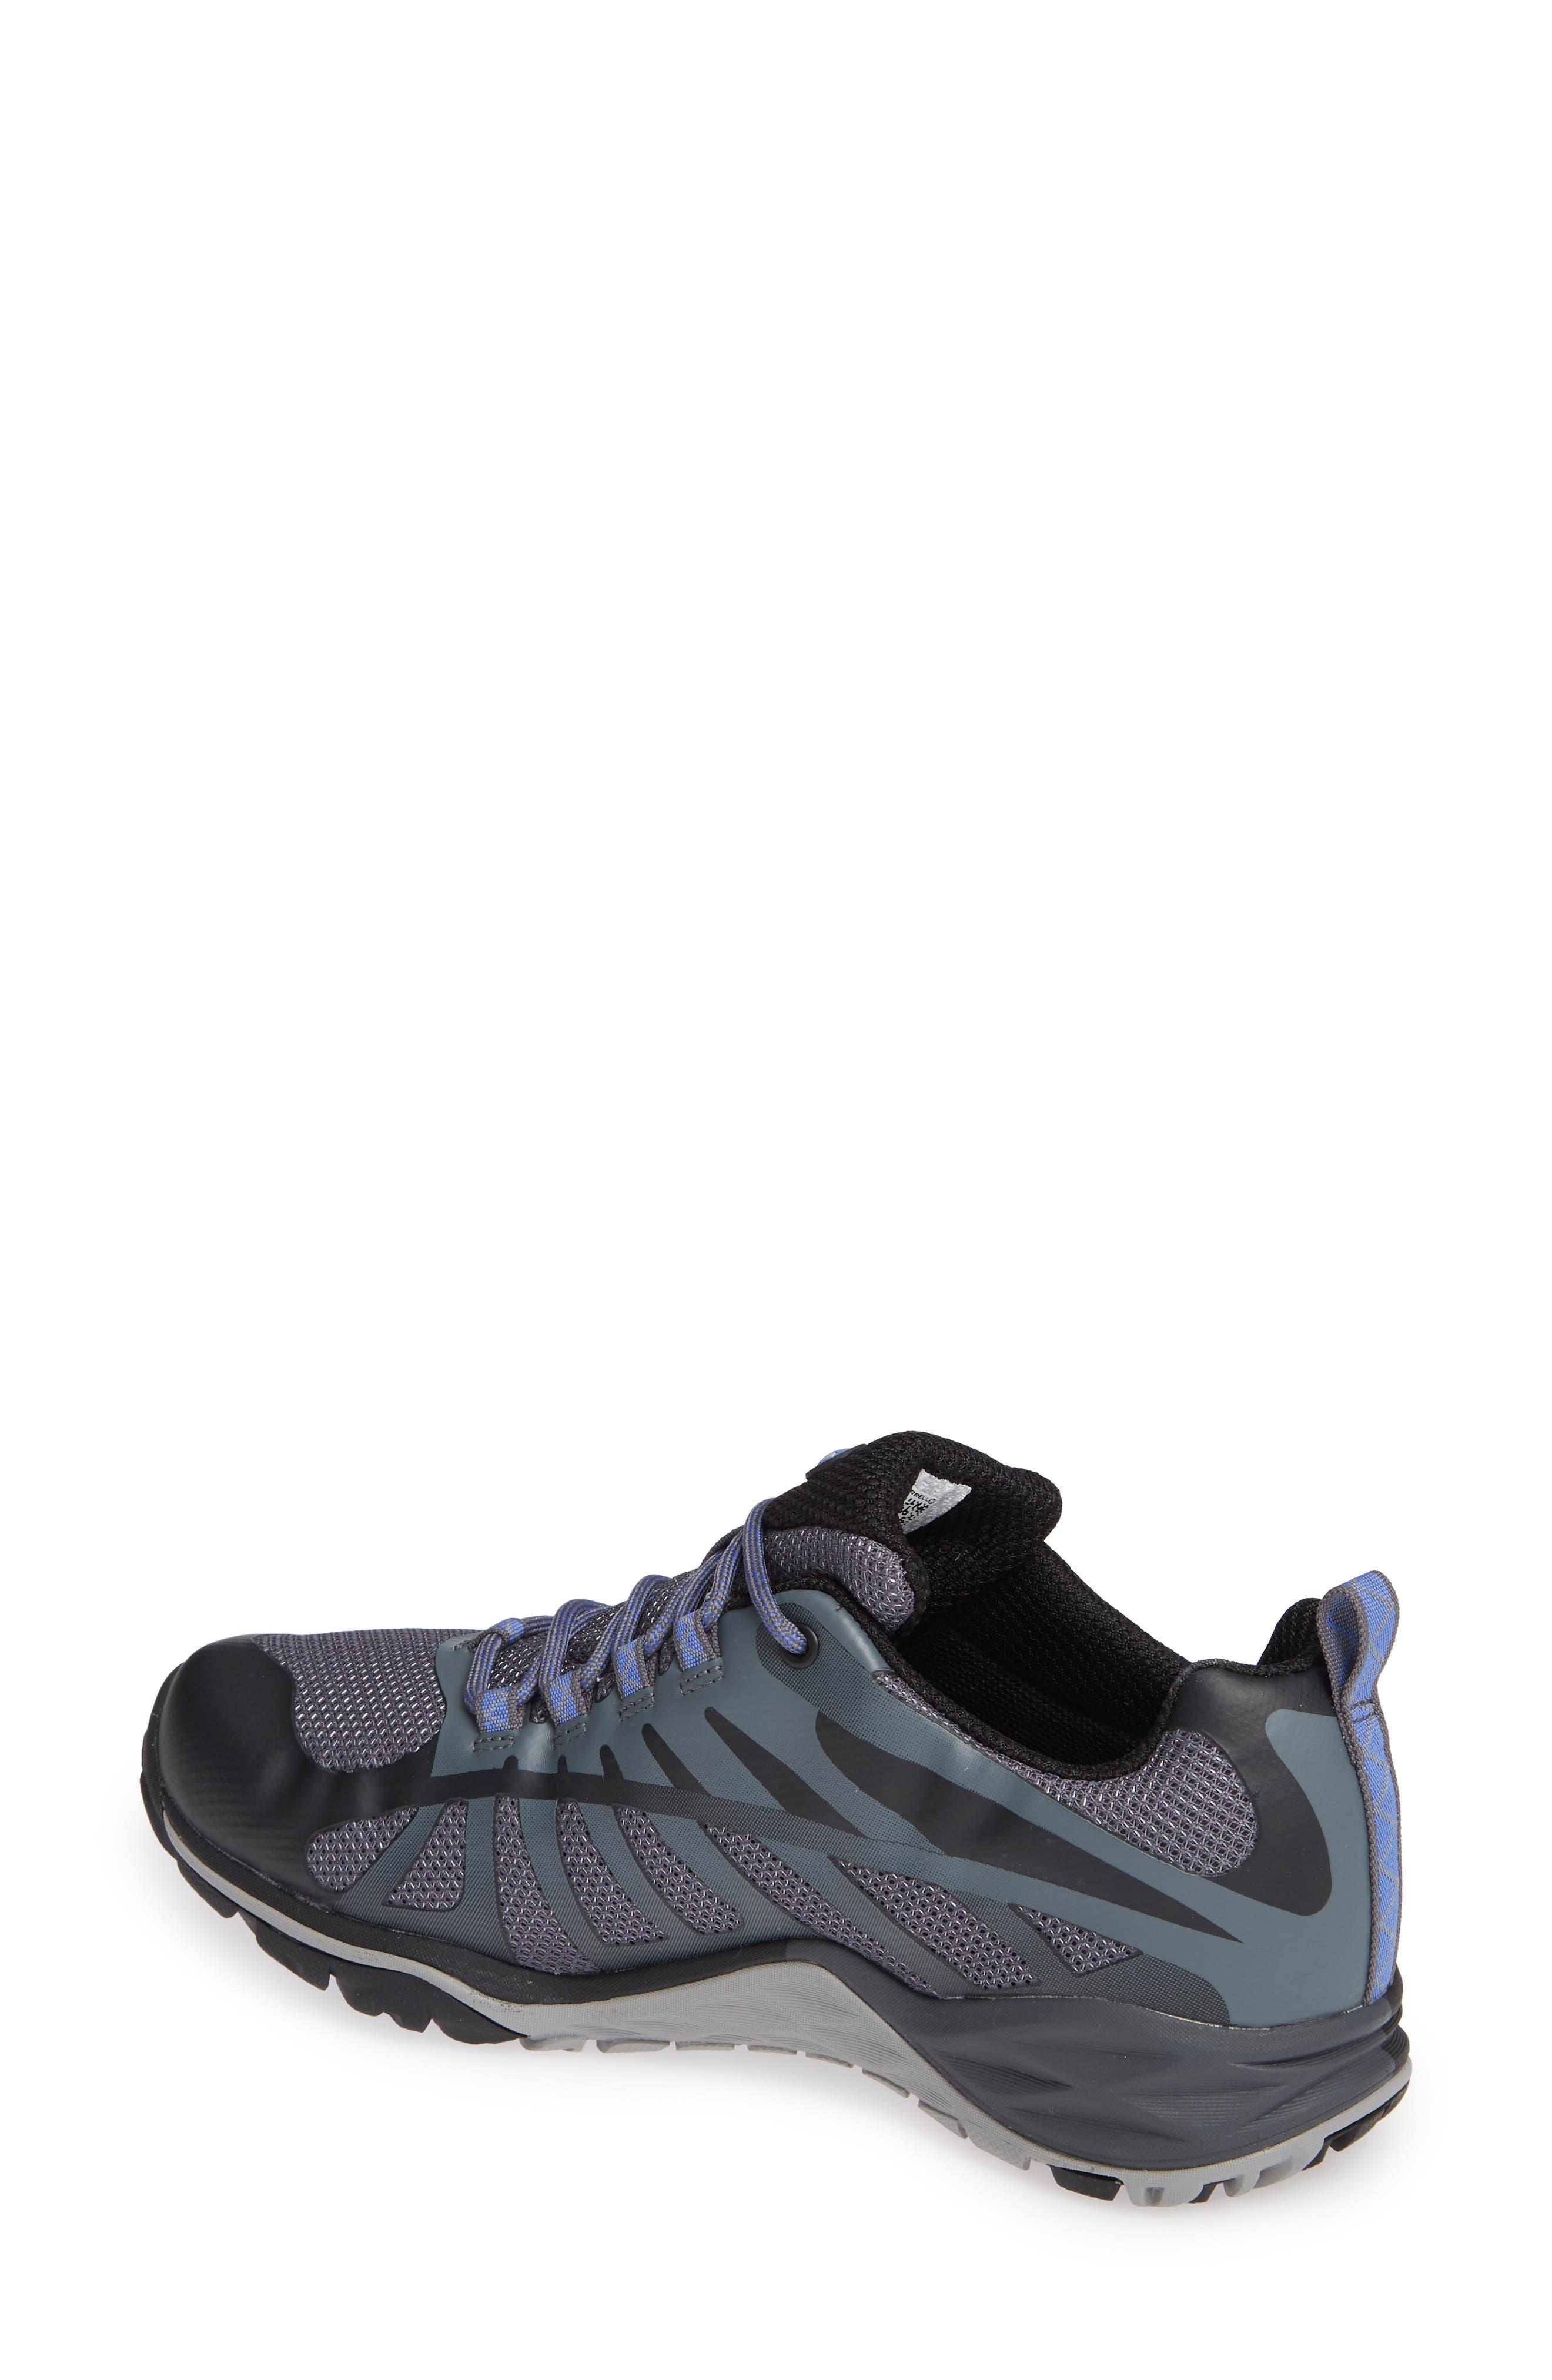 MERRELL, Siren Edge Waterproof Q2 Hiking Shoe, Alternate thumbnail 2, color, BLACK FABRIC